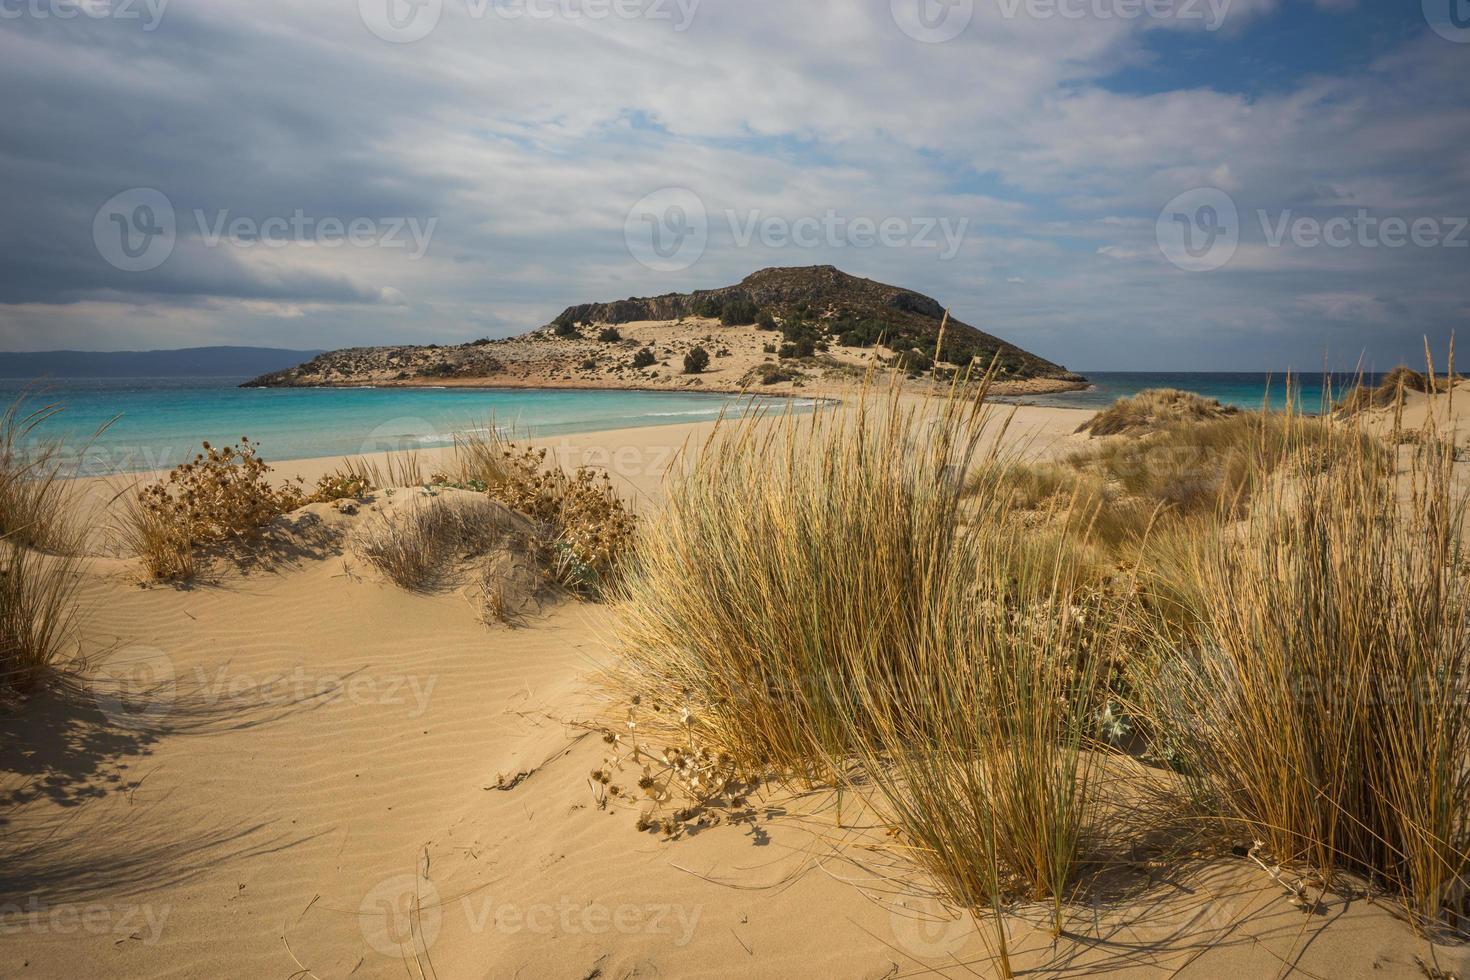 smalle vlecht naar het semi-eiland, simos strand, elafonisos, griekenland foto